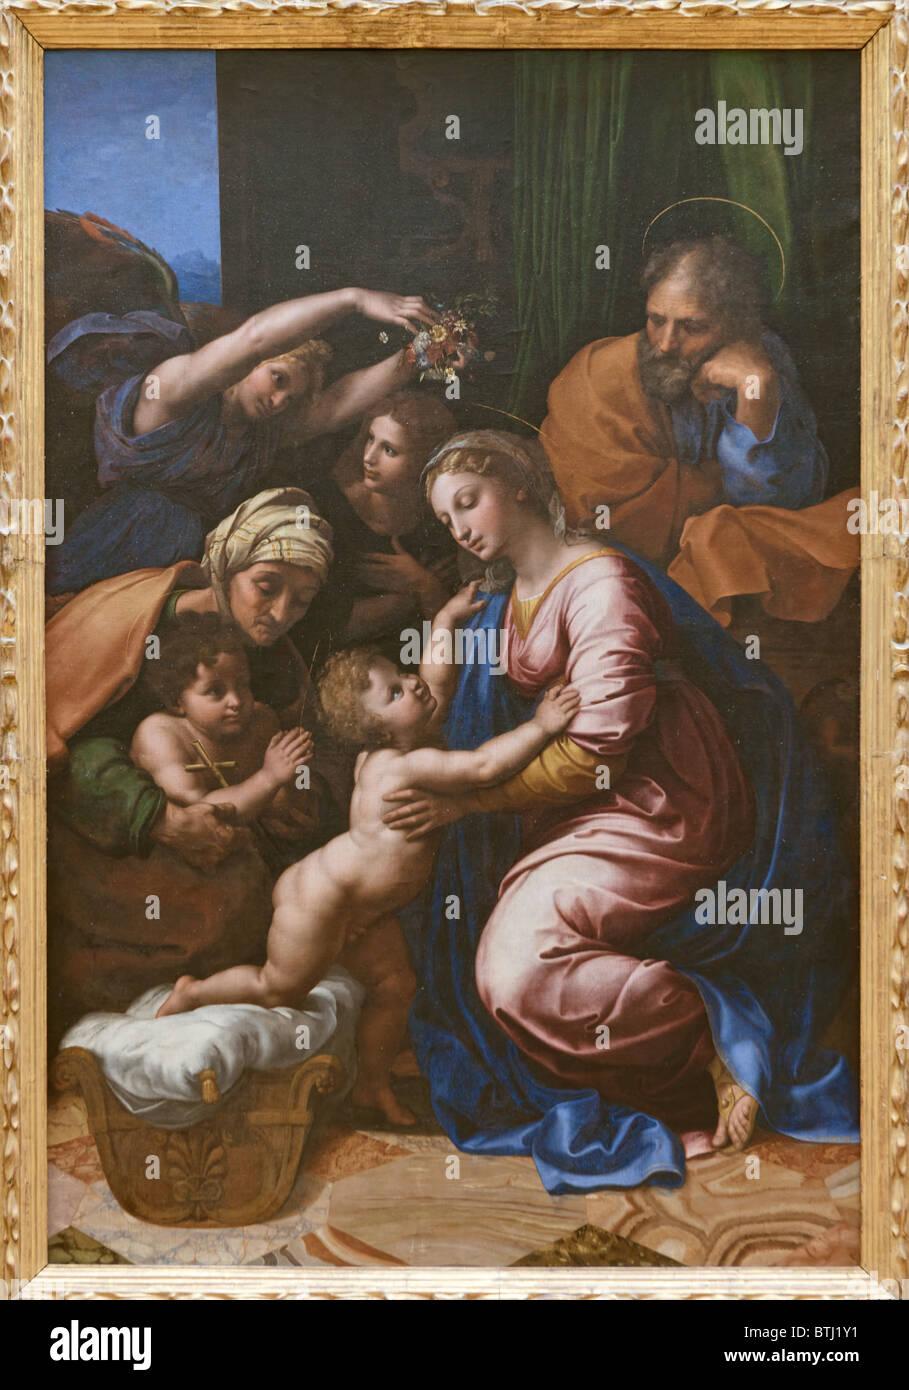 Gran Sagrada Familia por Rafael (Raffaello Sanzio da Urbino), c. 1518, Museo del Louvre en París Imagen De Stock